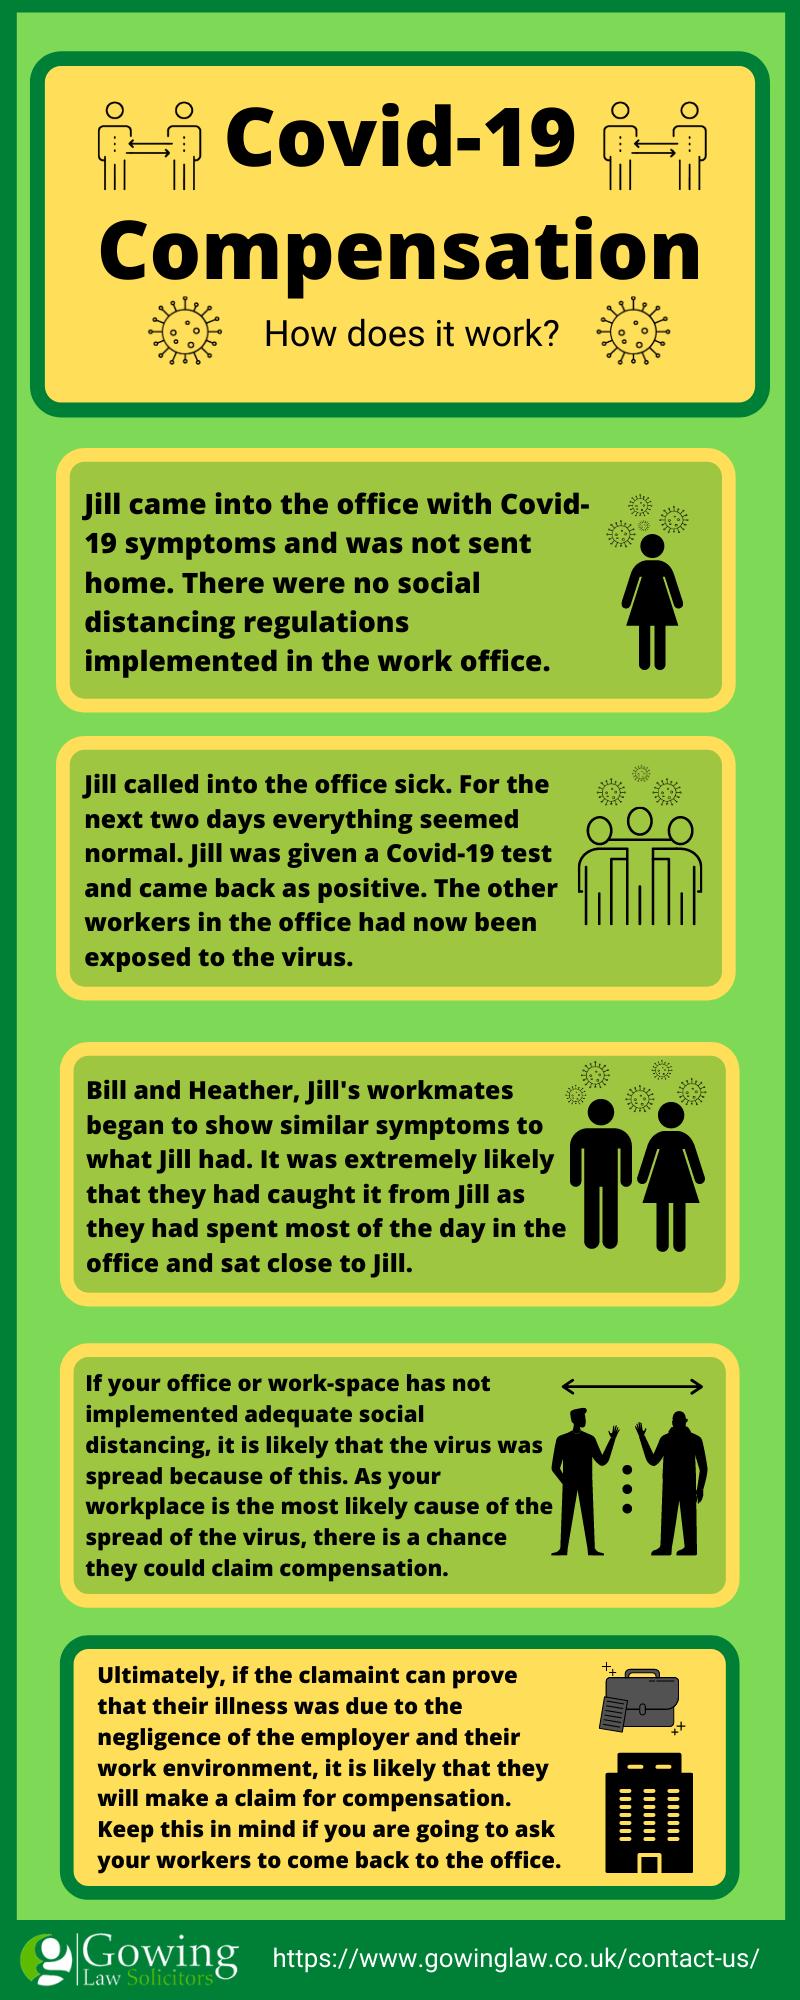 Covid-19 compensation infographic